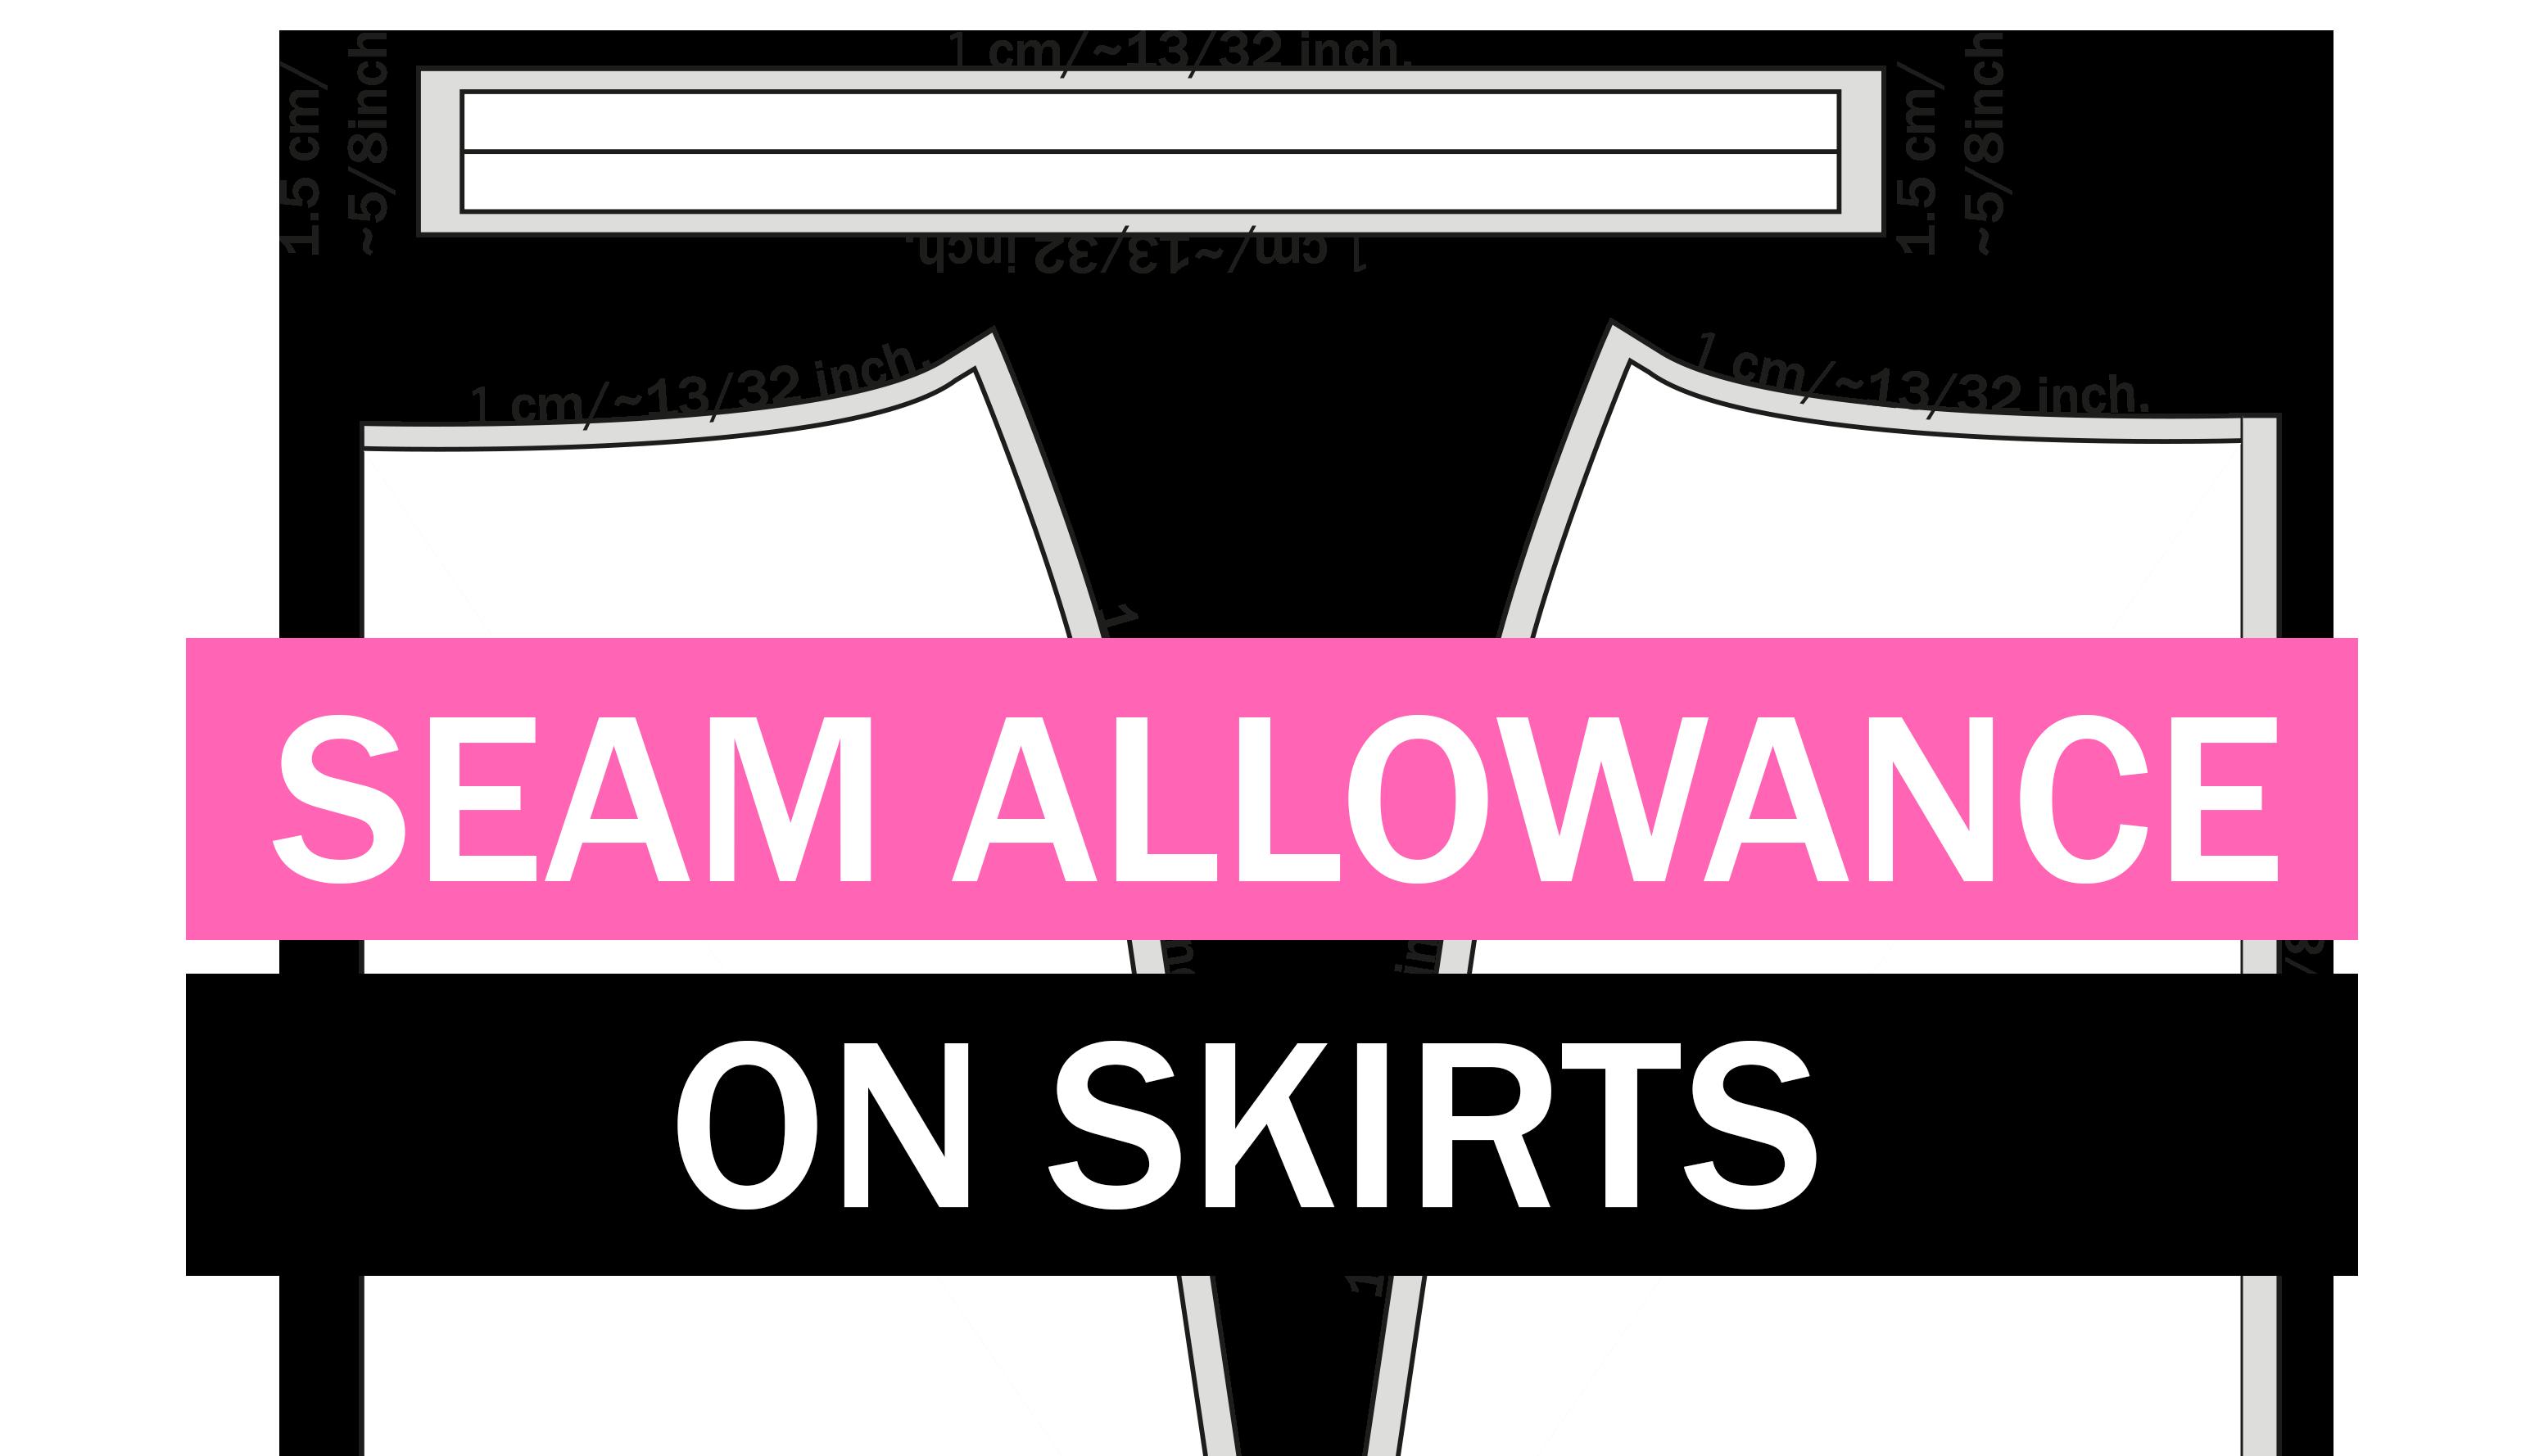 Seam allowance on knits